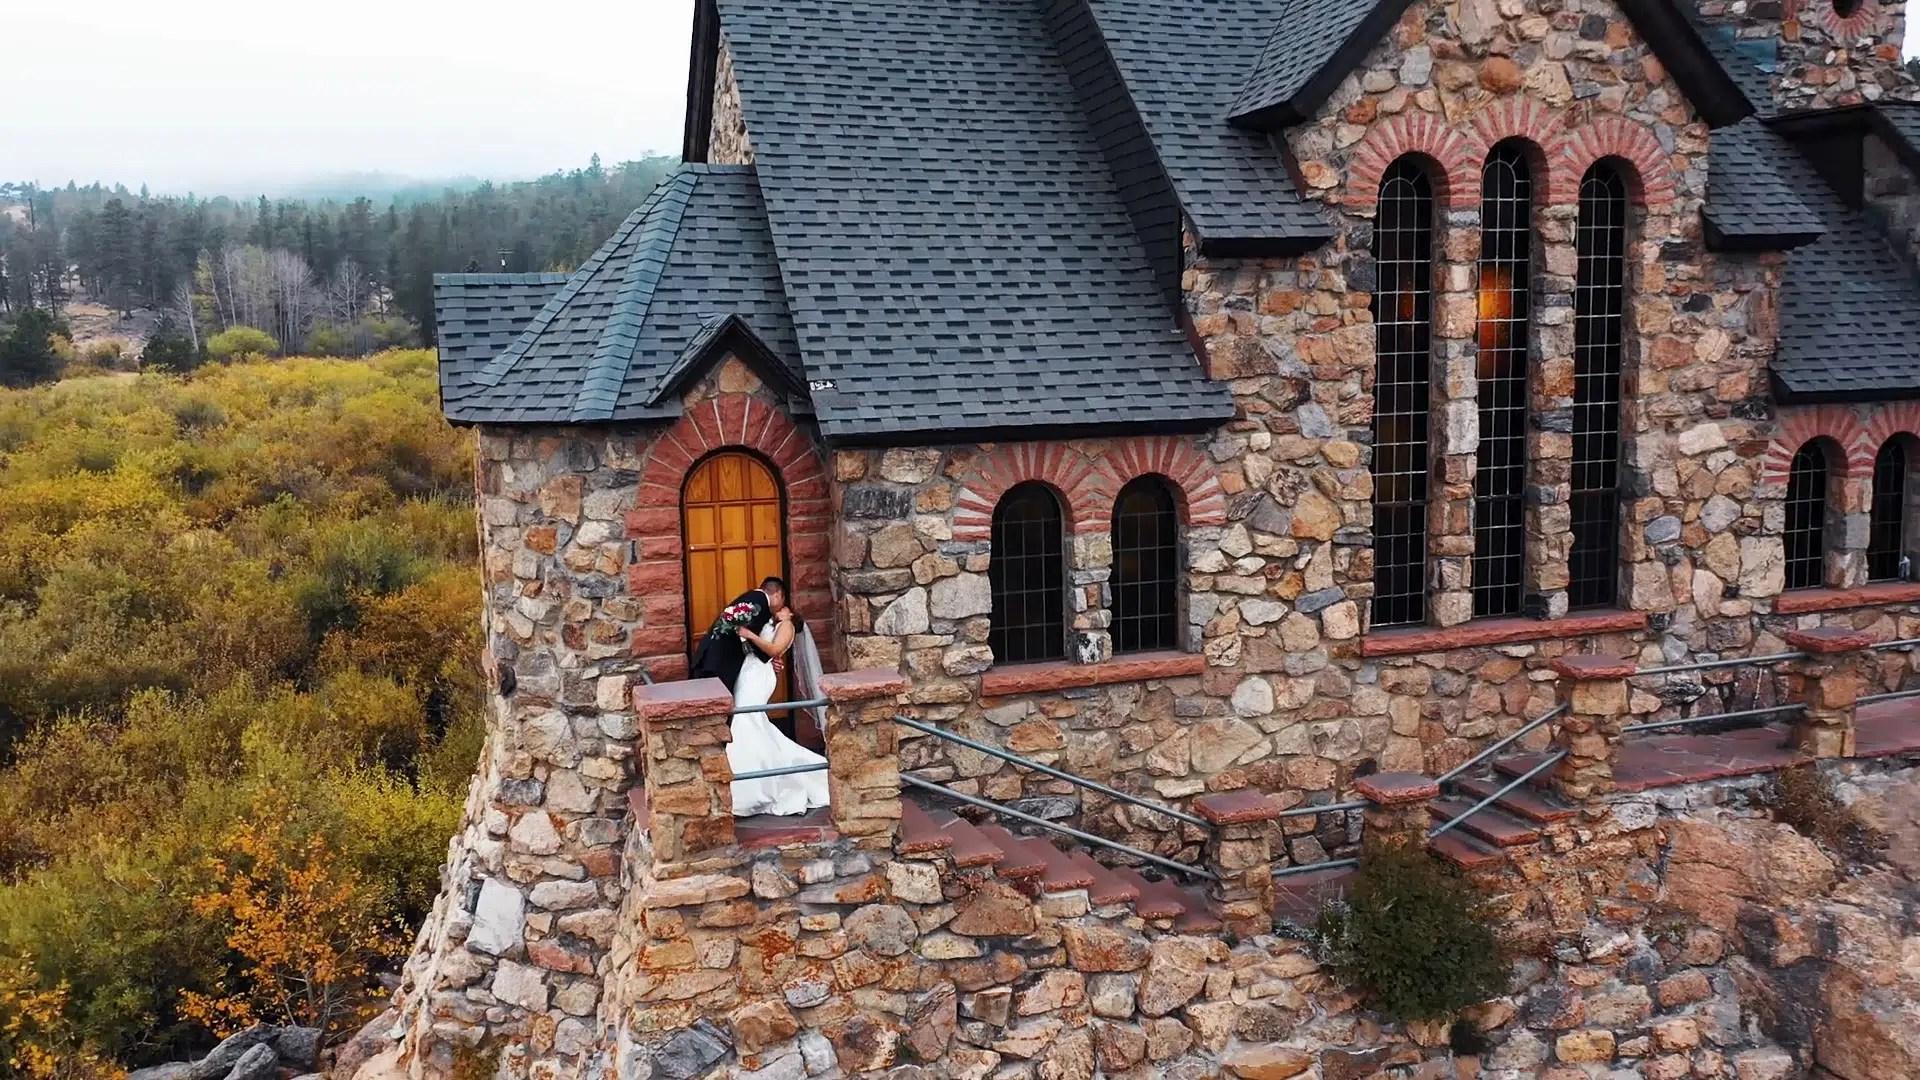 Shelby & Melissa Destination Wedding Highlights Video in Estes Park, CO